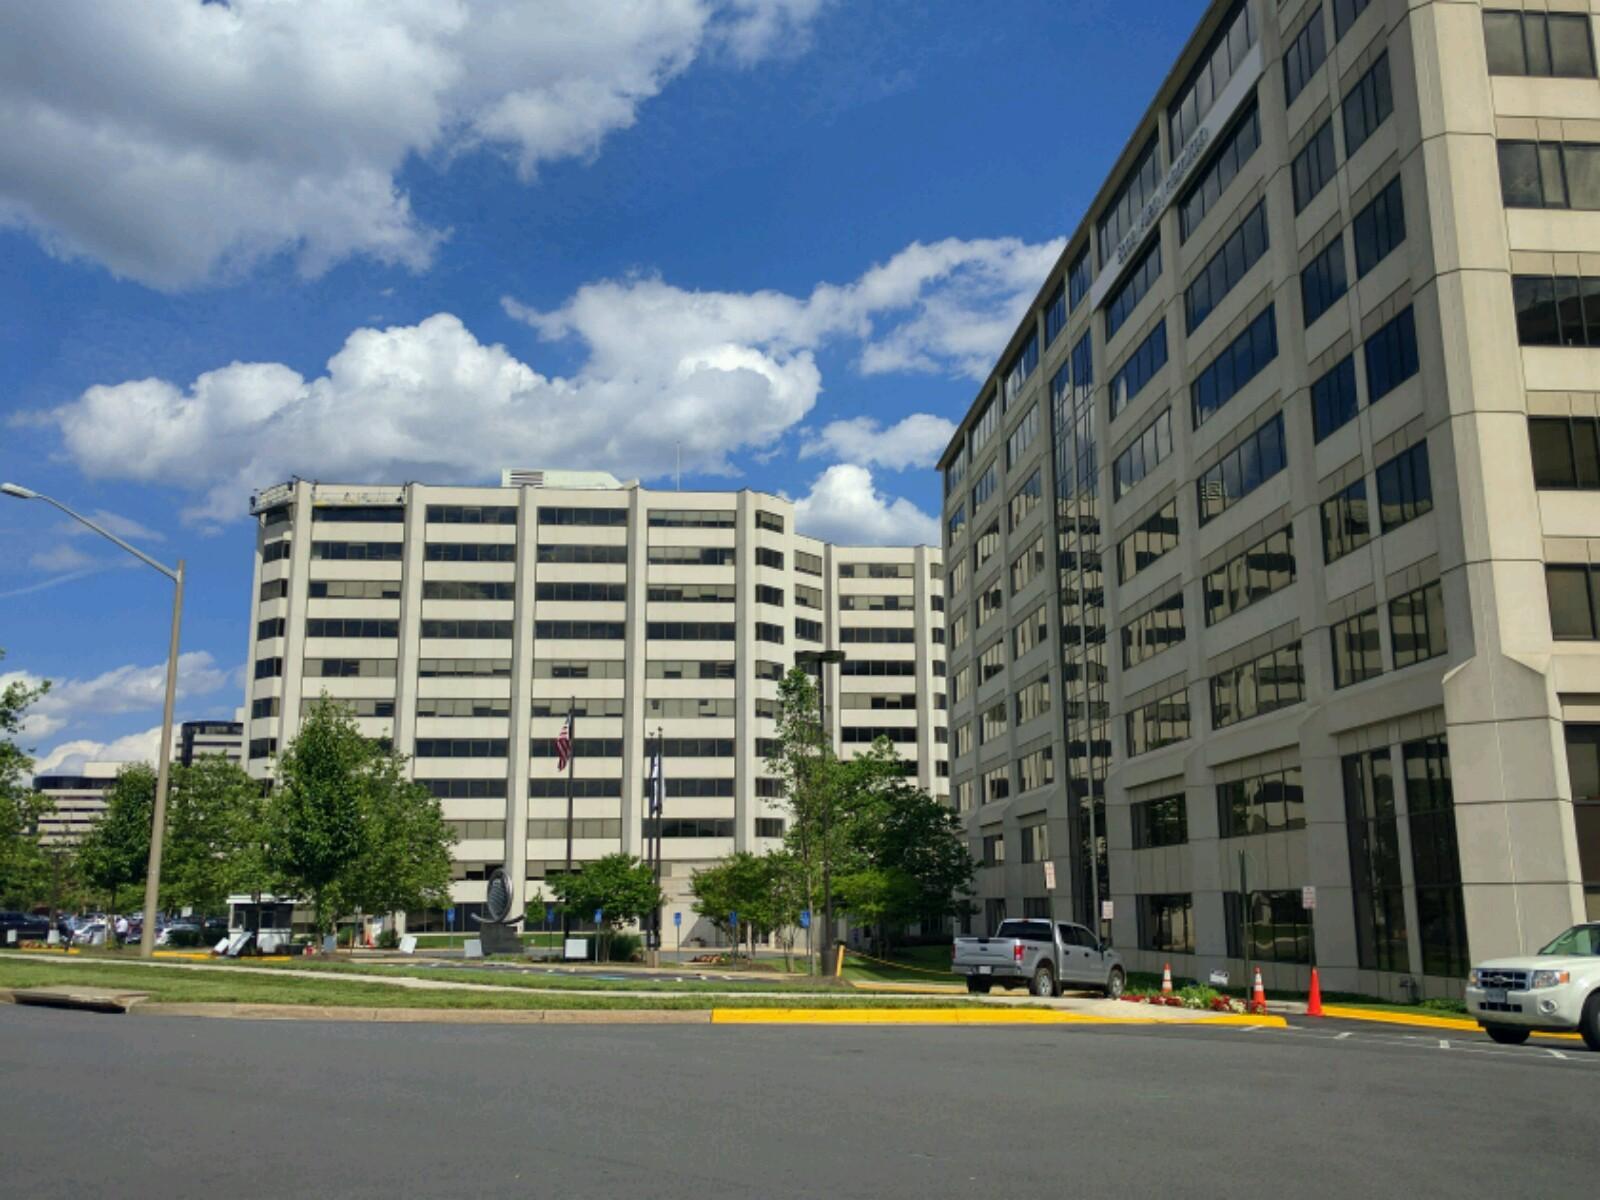 Booz Allen Hamilton's corporate headquarters in McLean, Virginia.